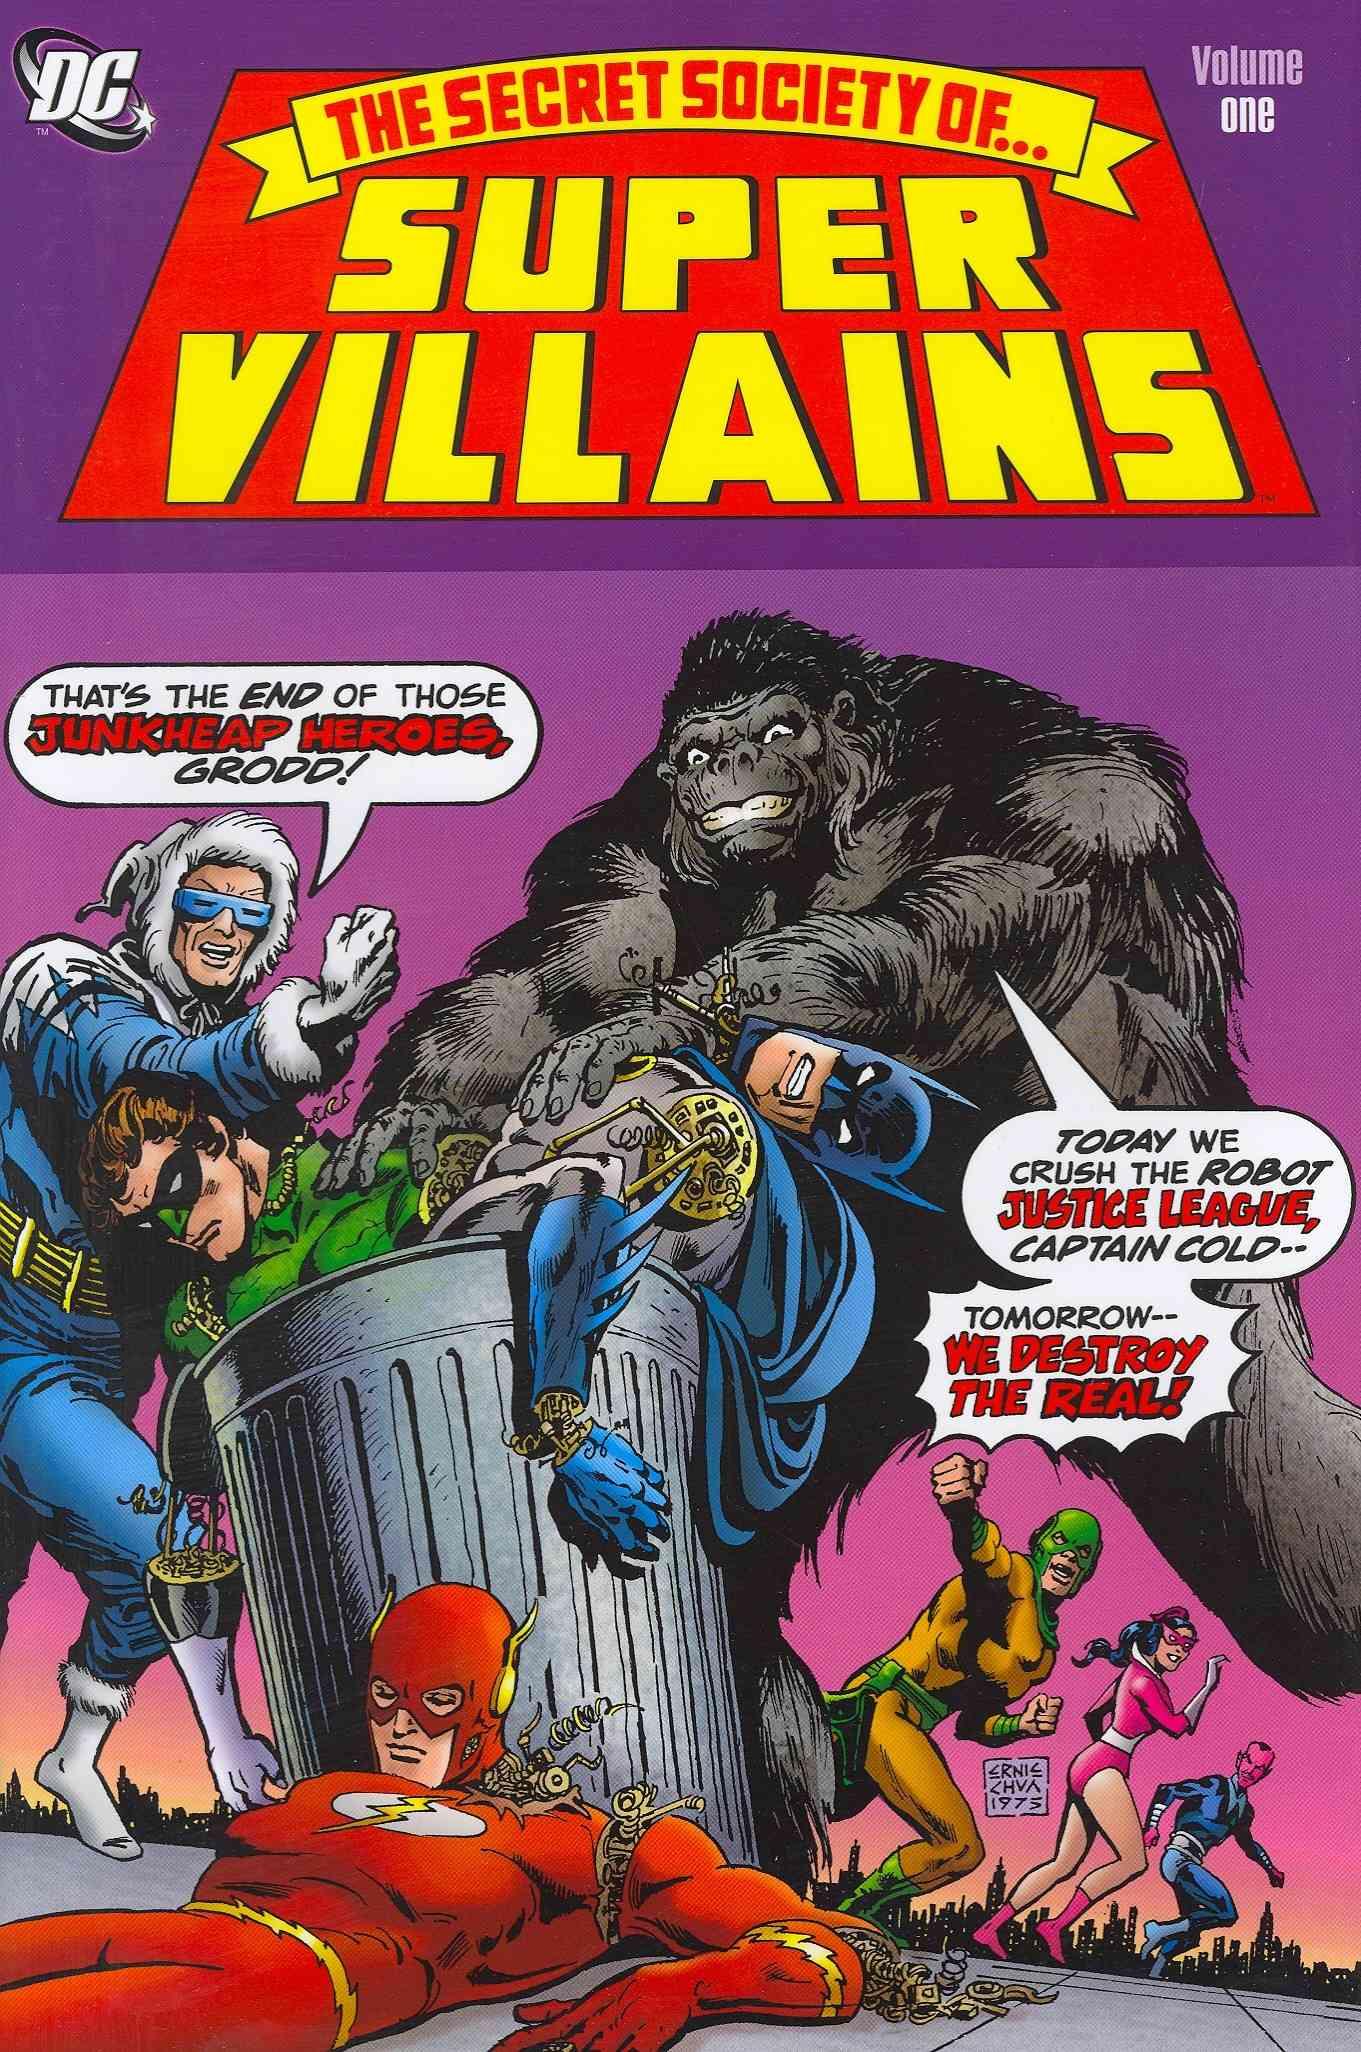 The Secret Society of Super-Villains 1 (Hardcover)